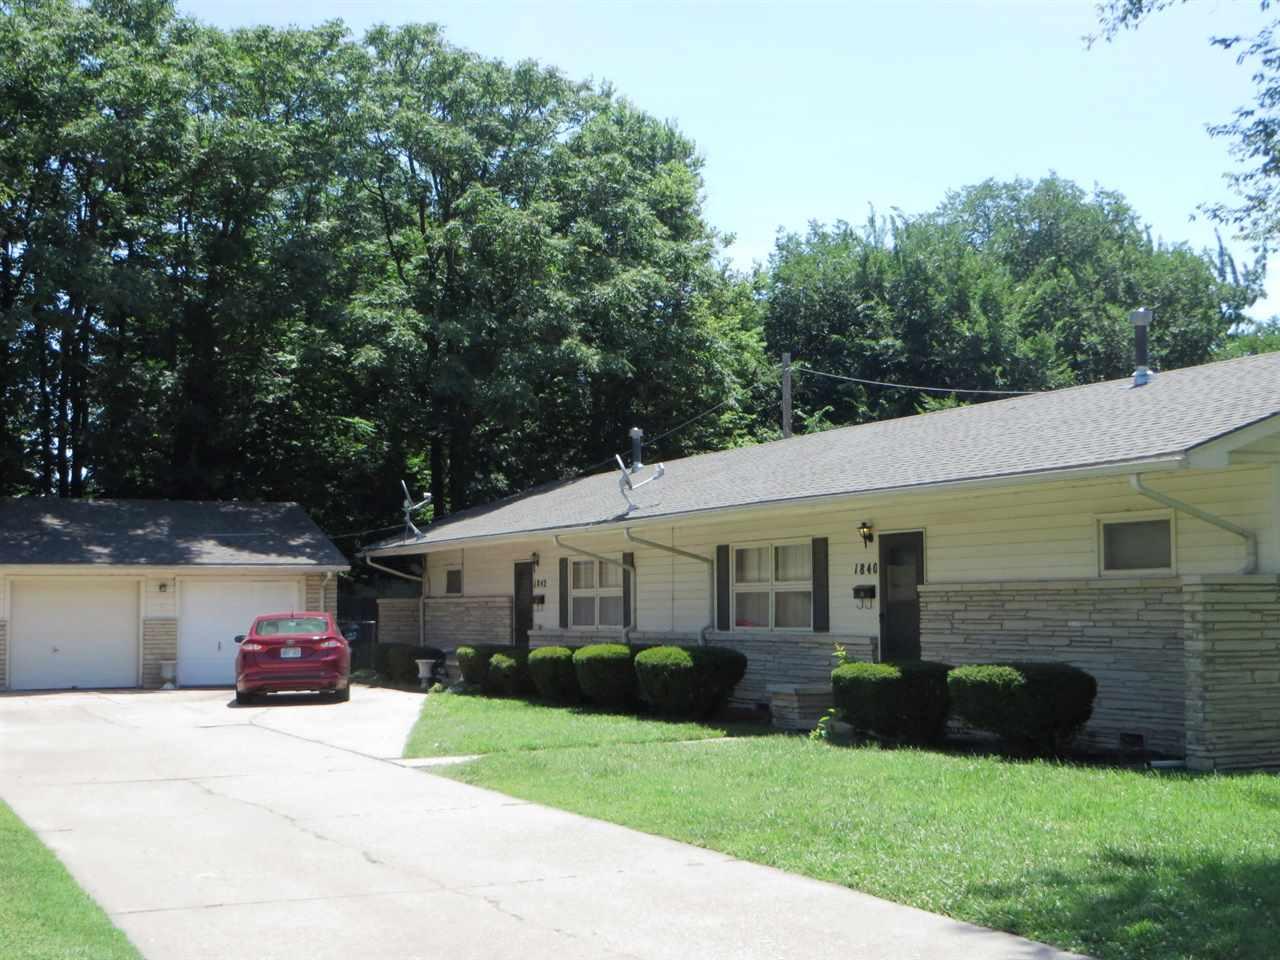 1840 S Lorraine Ave, Wichita, KS 67211